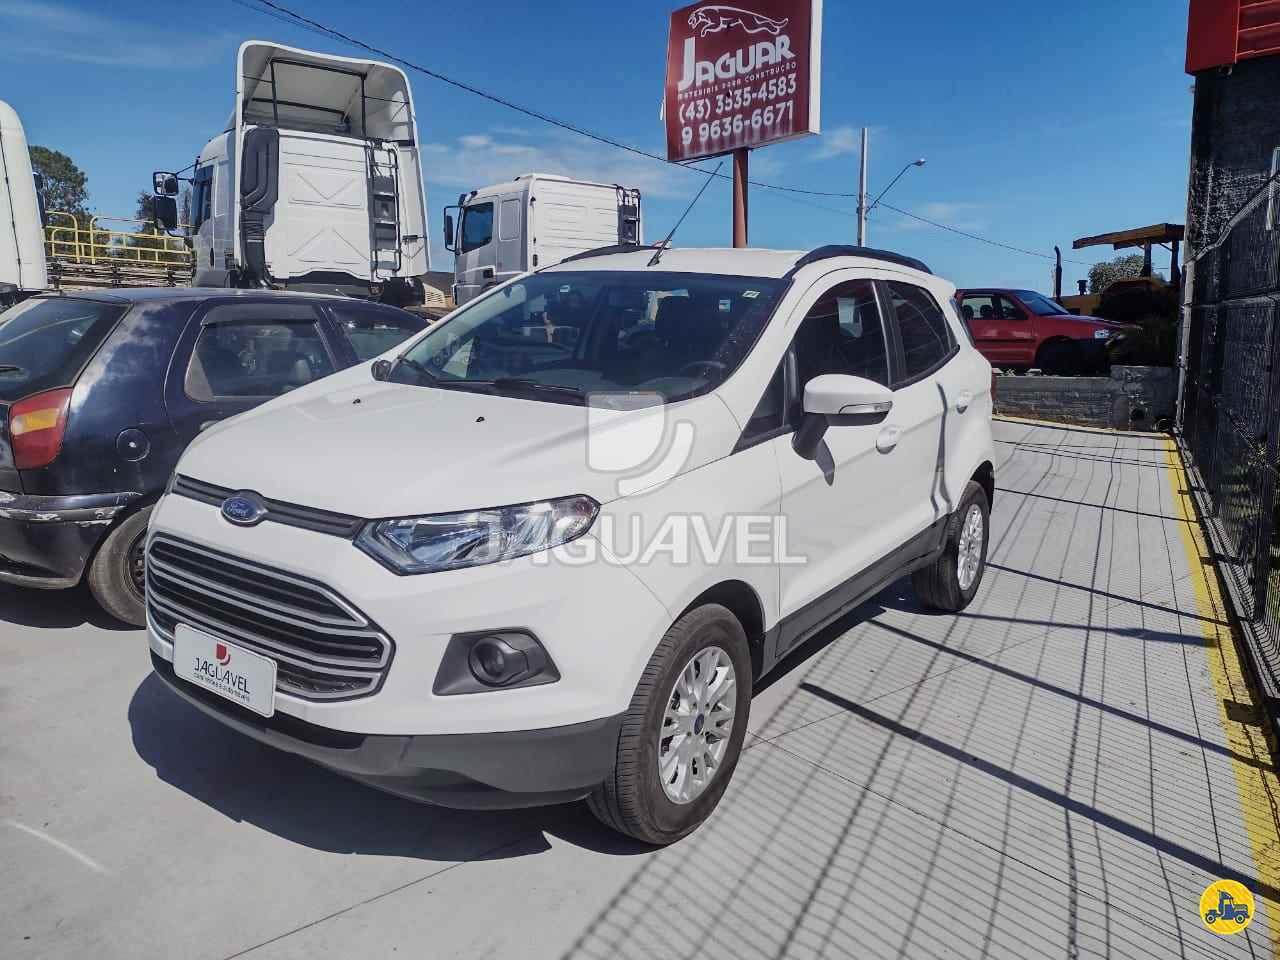 CARRO FORD EcoSport 1.6 SE Jaguavel Caminhões JAGUARIAIVA PARANÁ PR